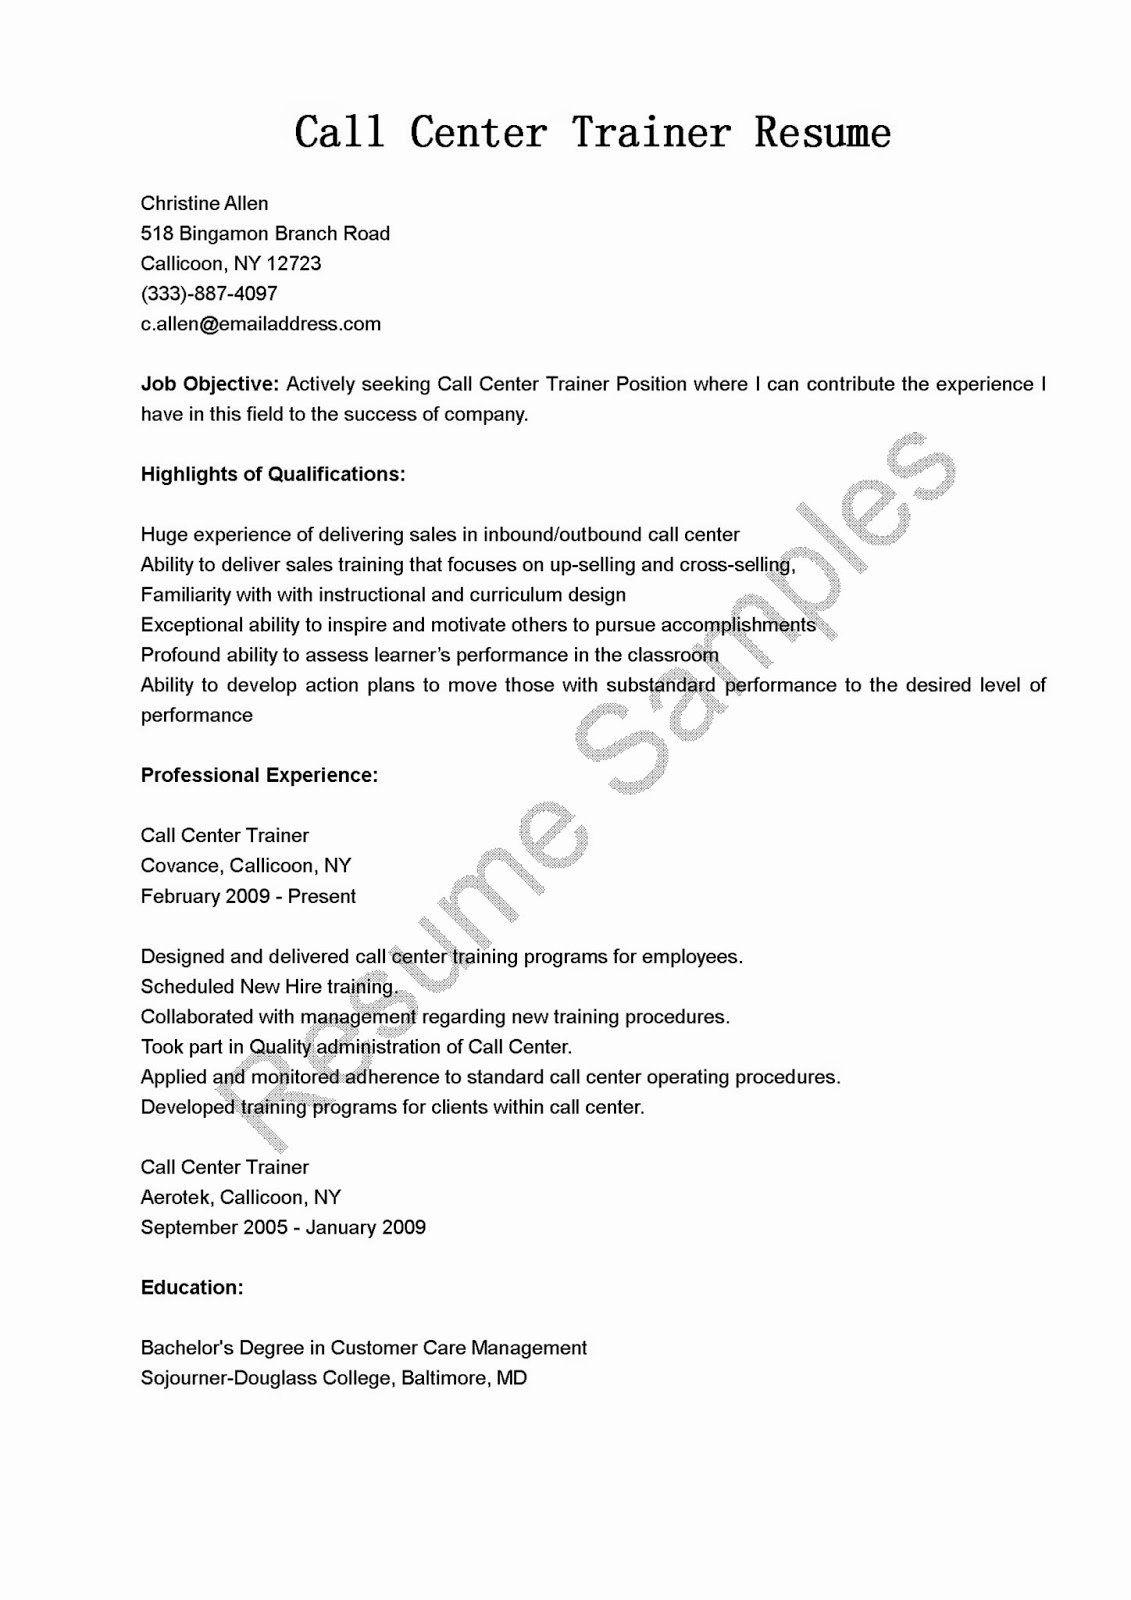 Call Center Jobs Description Resume Beautiful Resume Samples Call Center Trainer Resume Sample Proposal Templates Writing A Business Proposal Resume